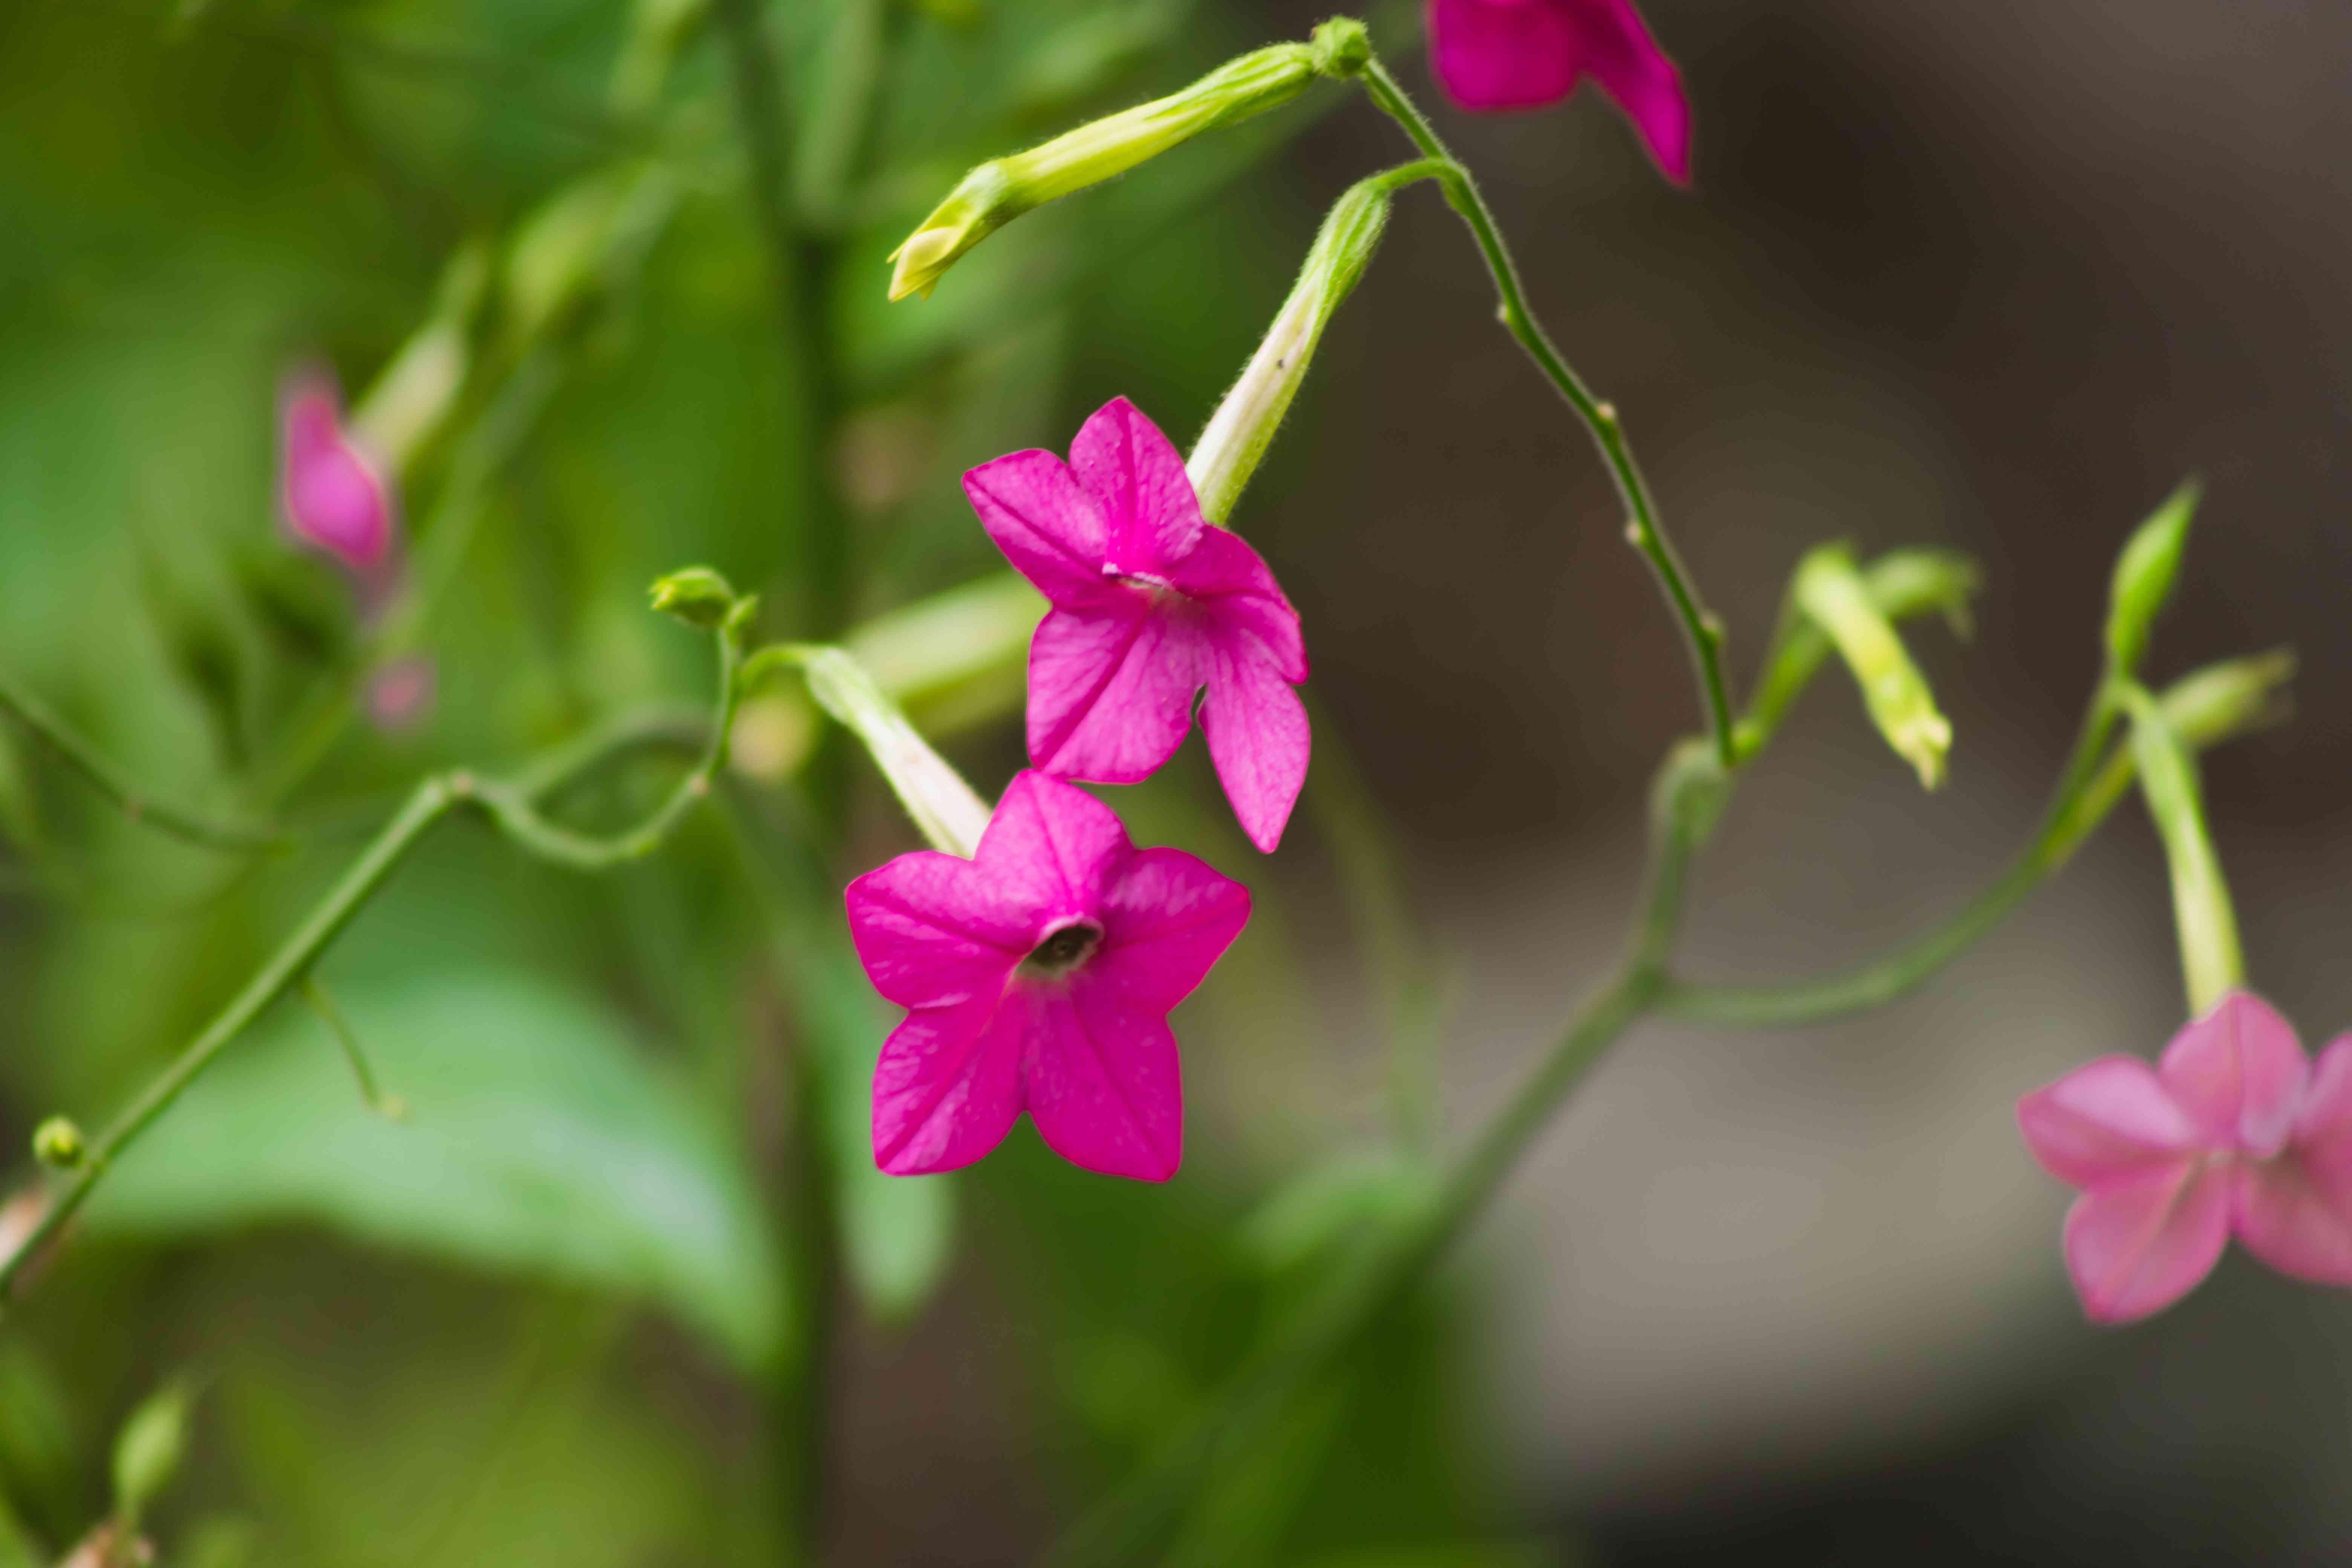 Flowering tobacco plant fuschia flowers closeup